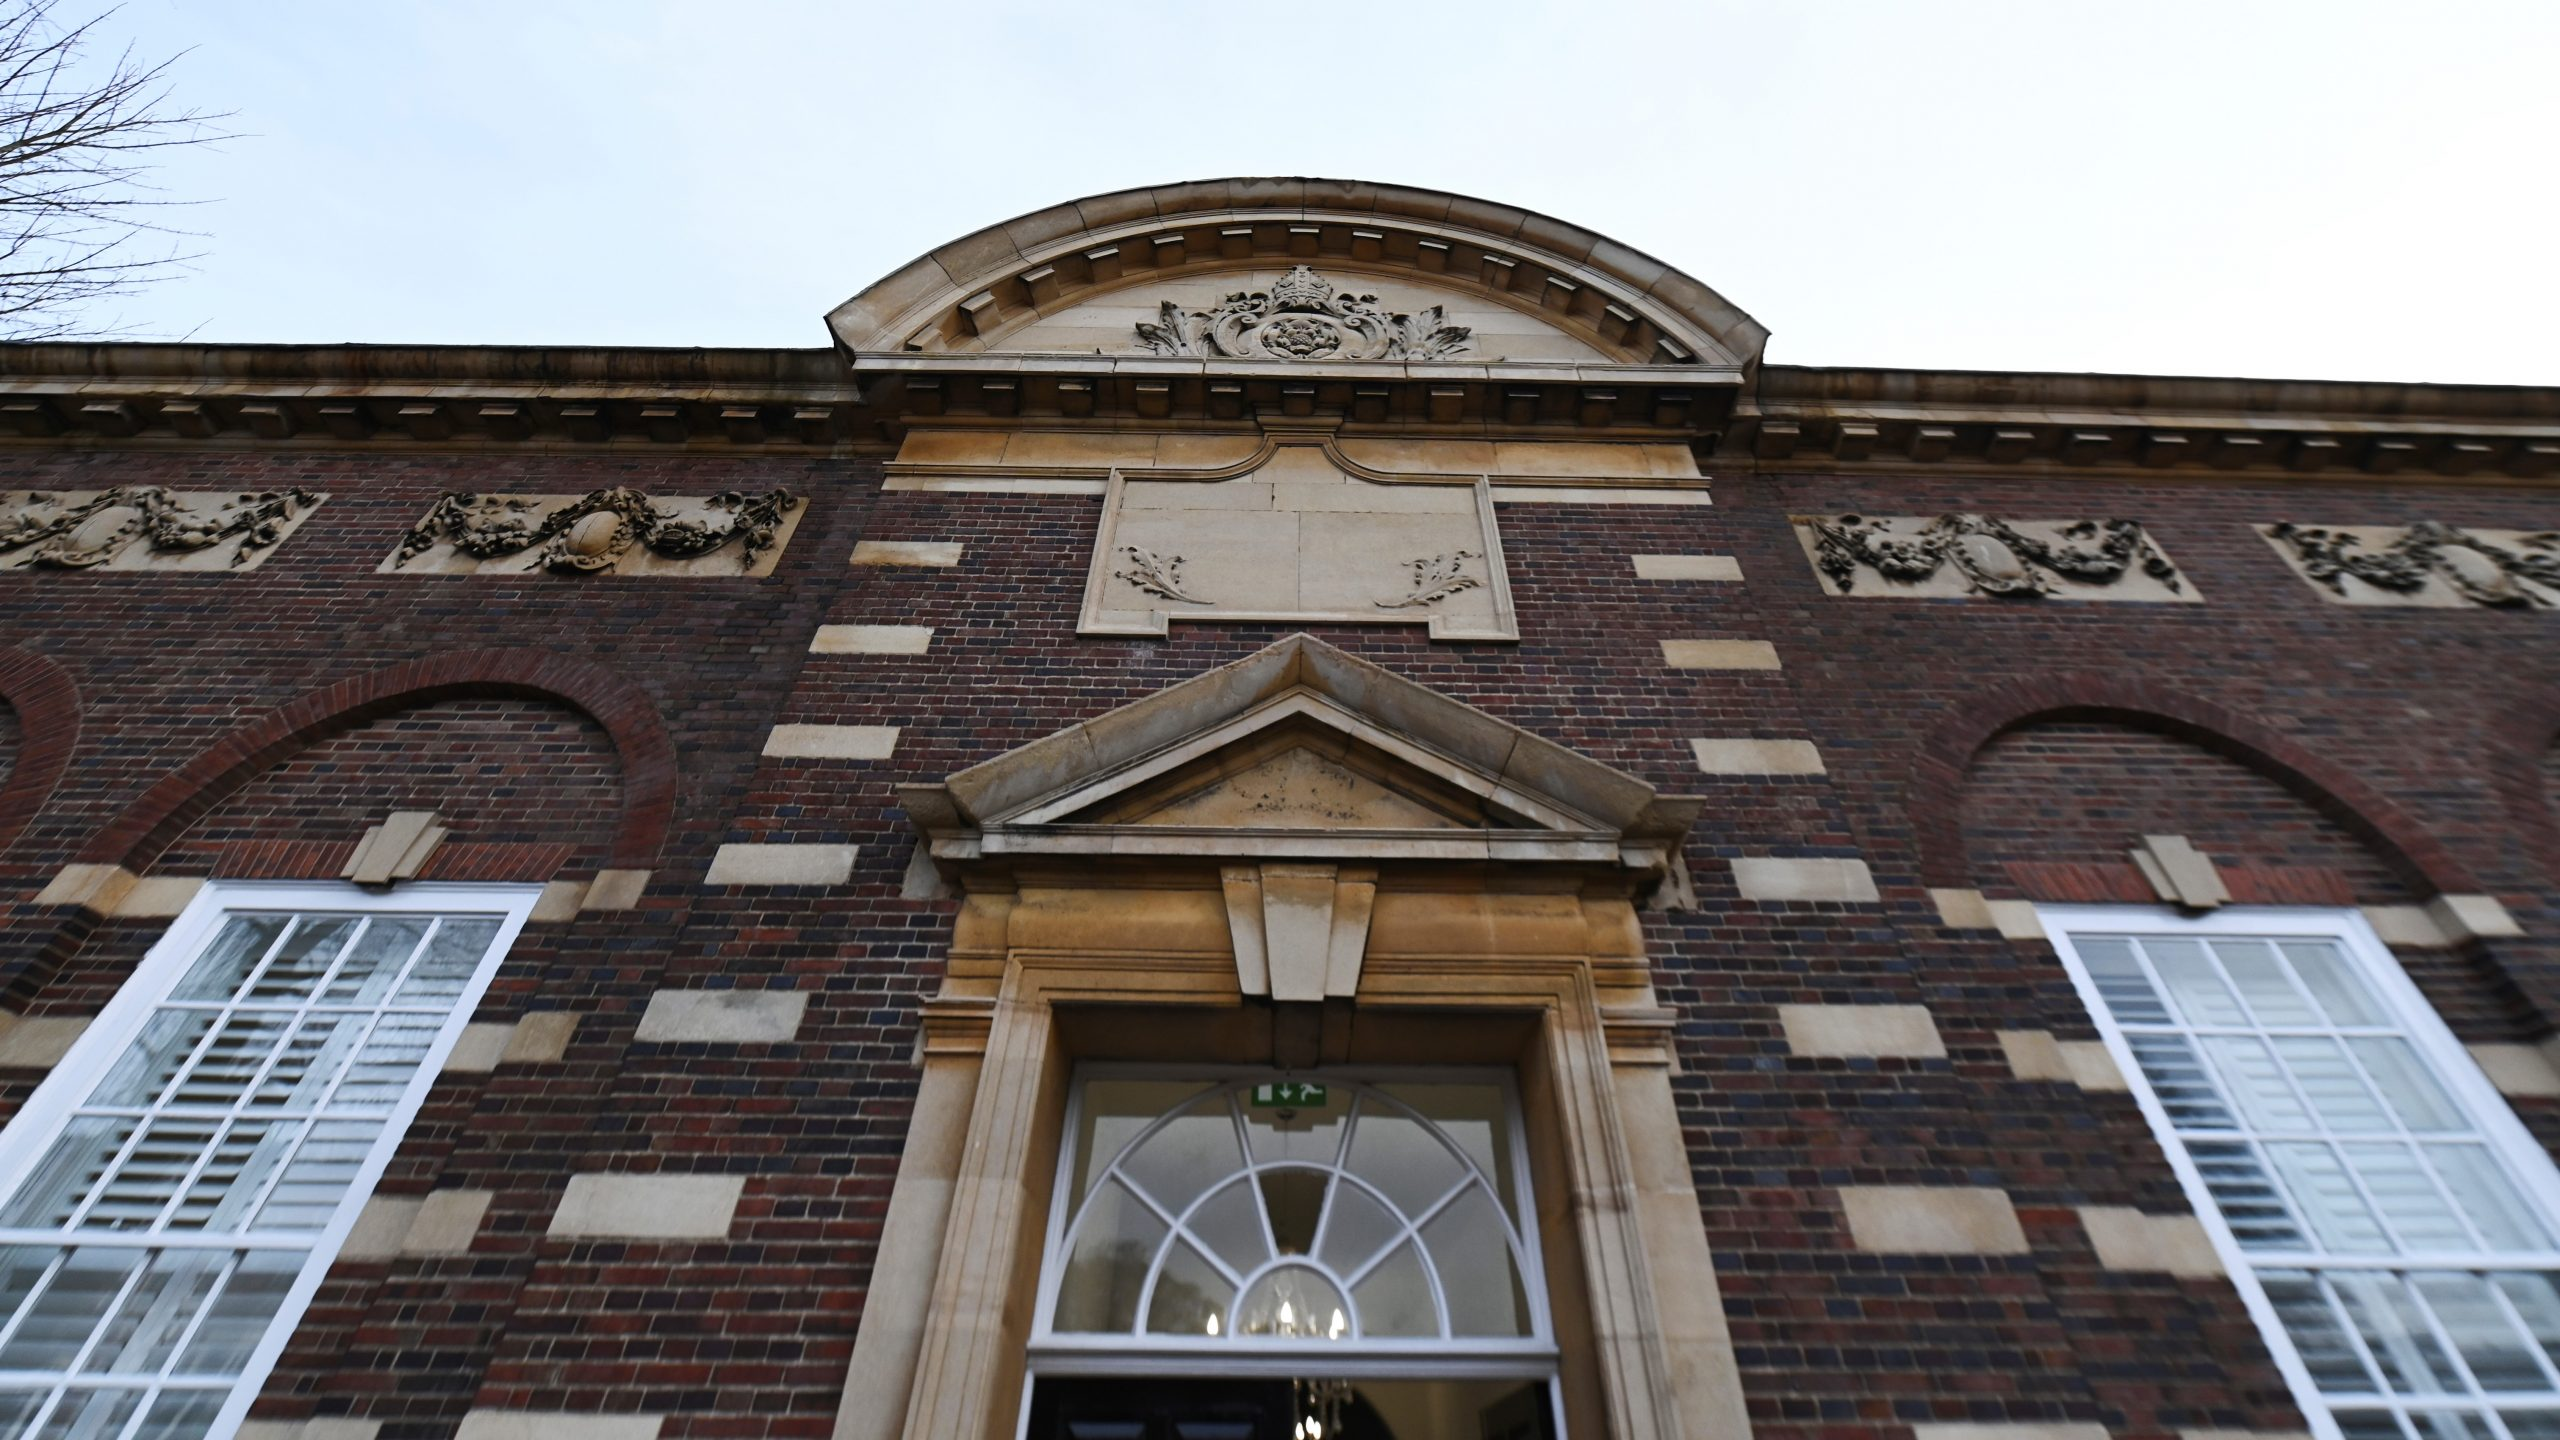 The Old Art School